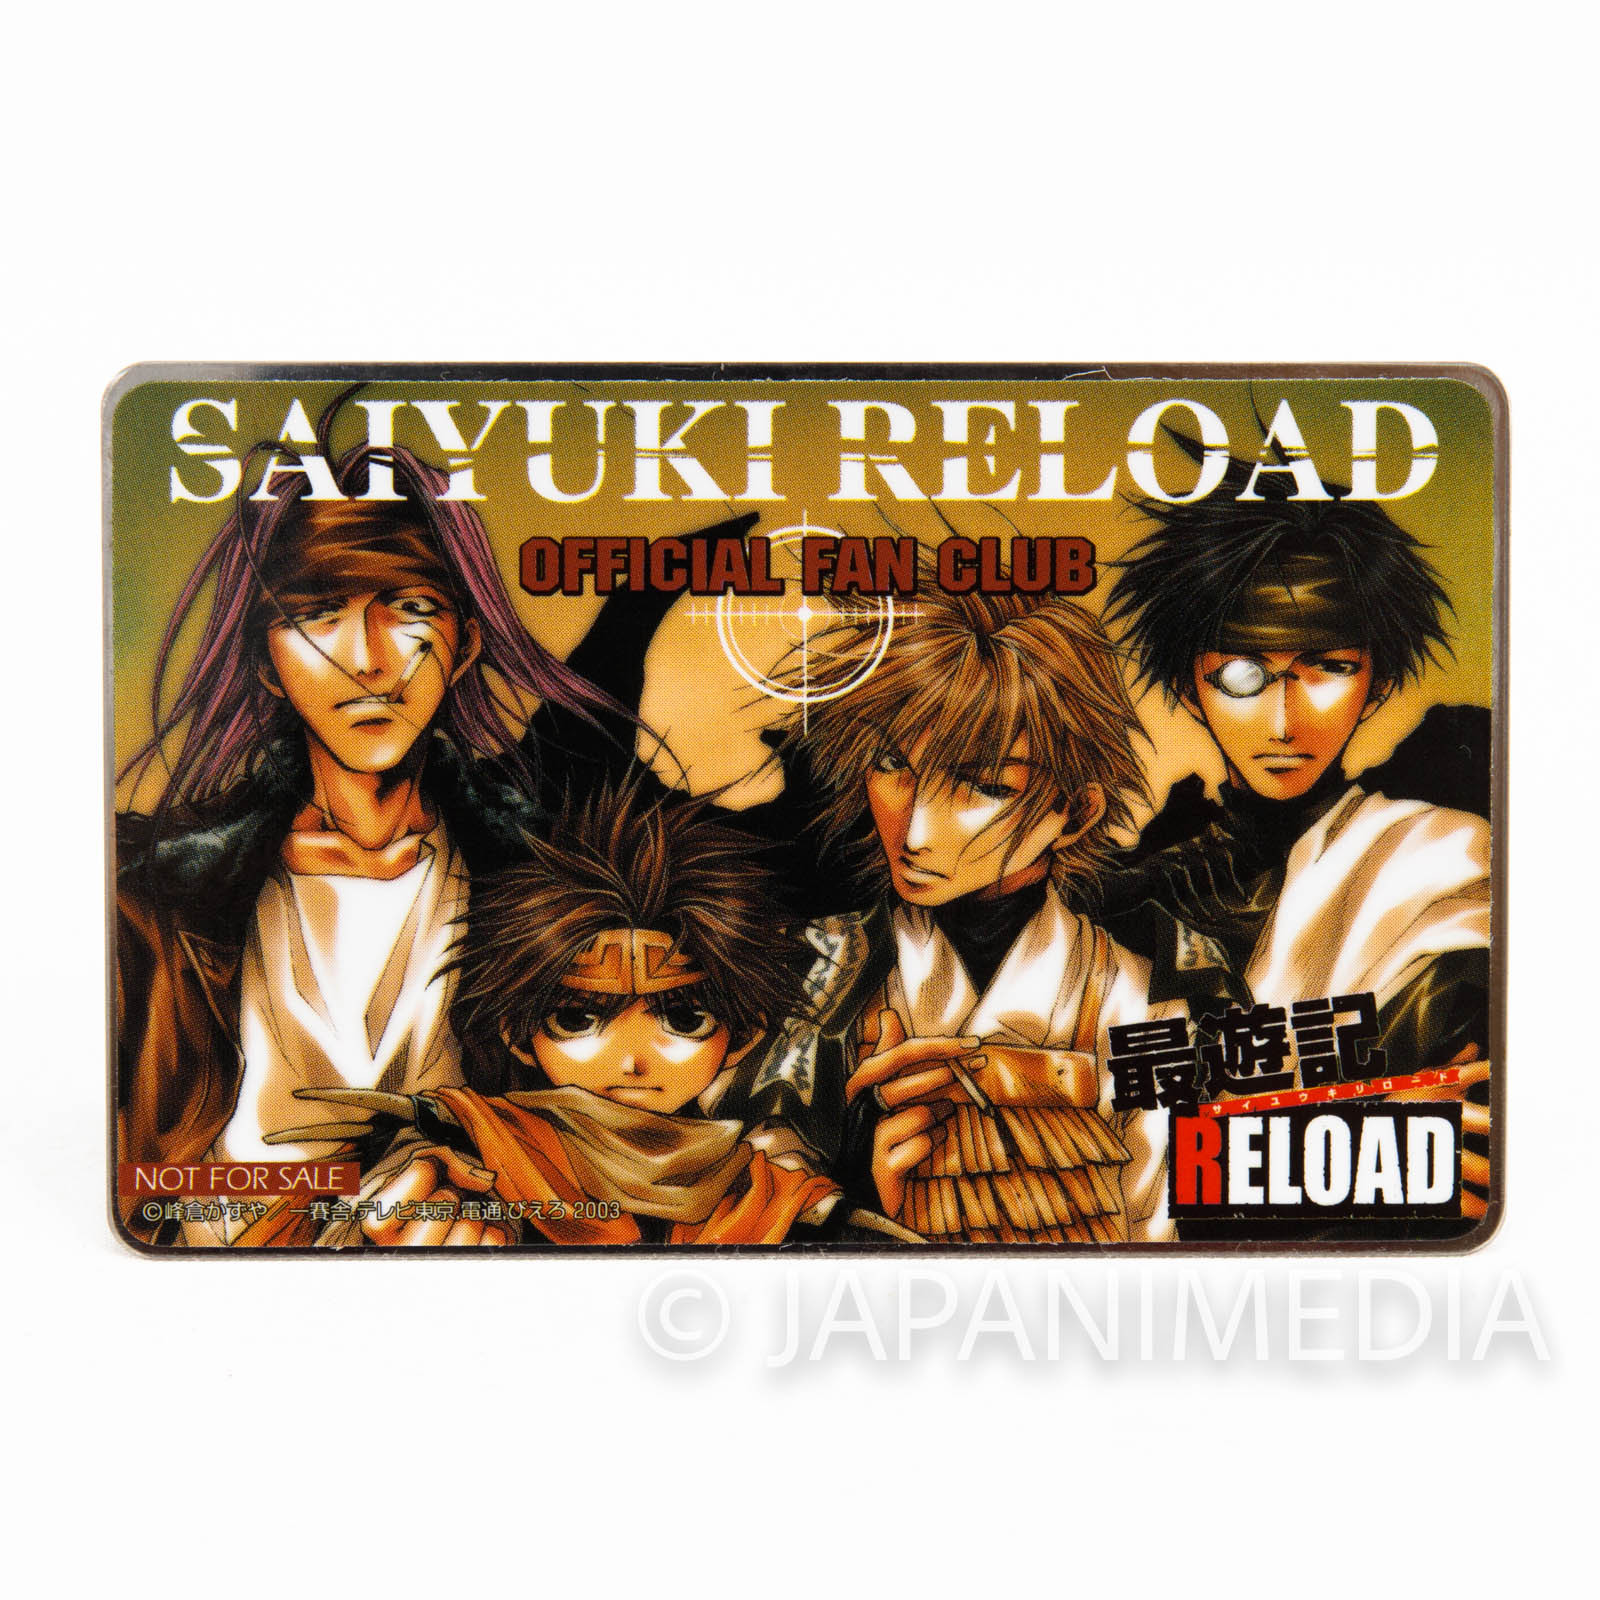 RARE!! SAIYUKI Reload Card Mirror official fan club JAPAN MANGA